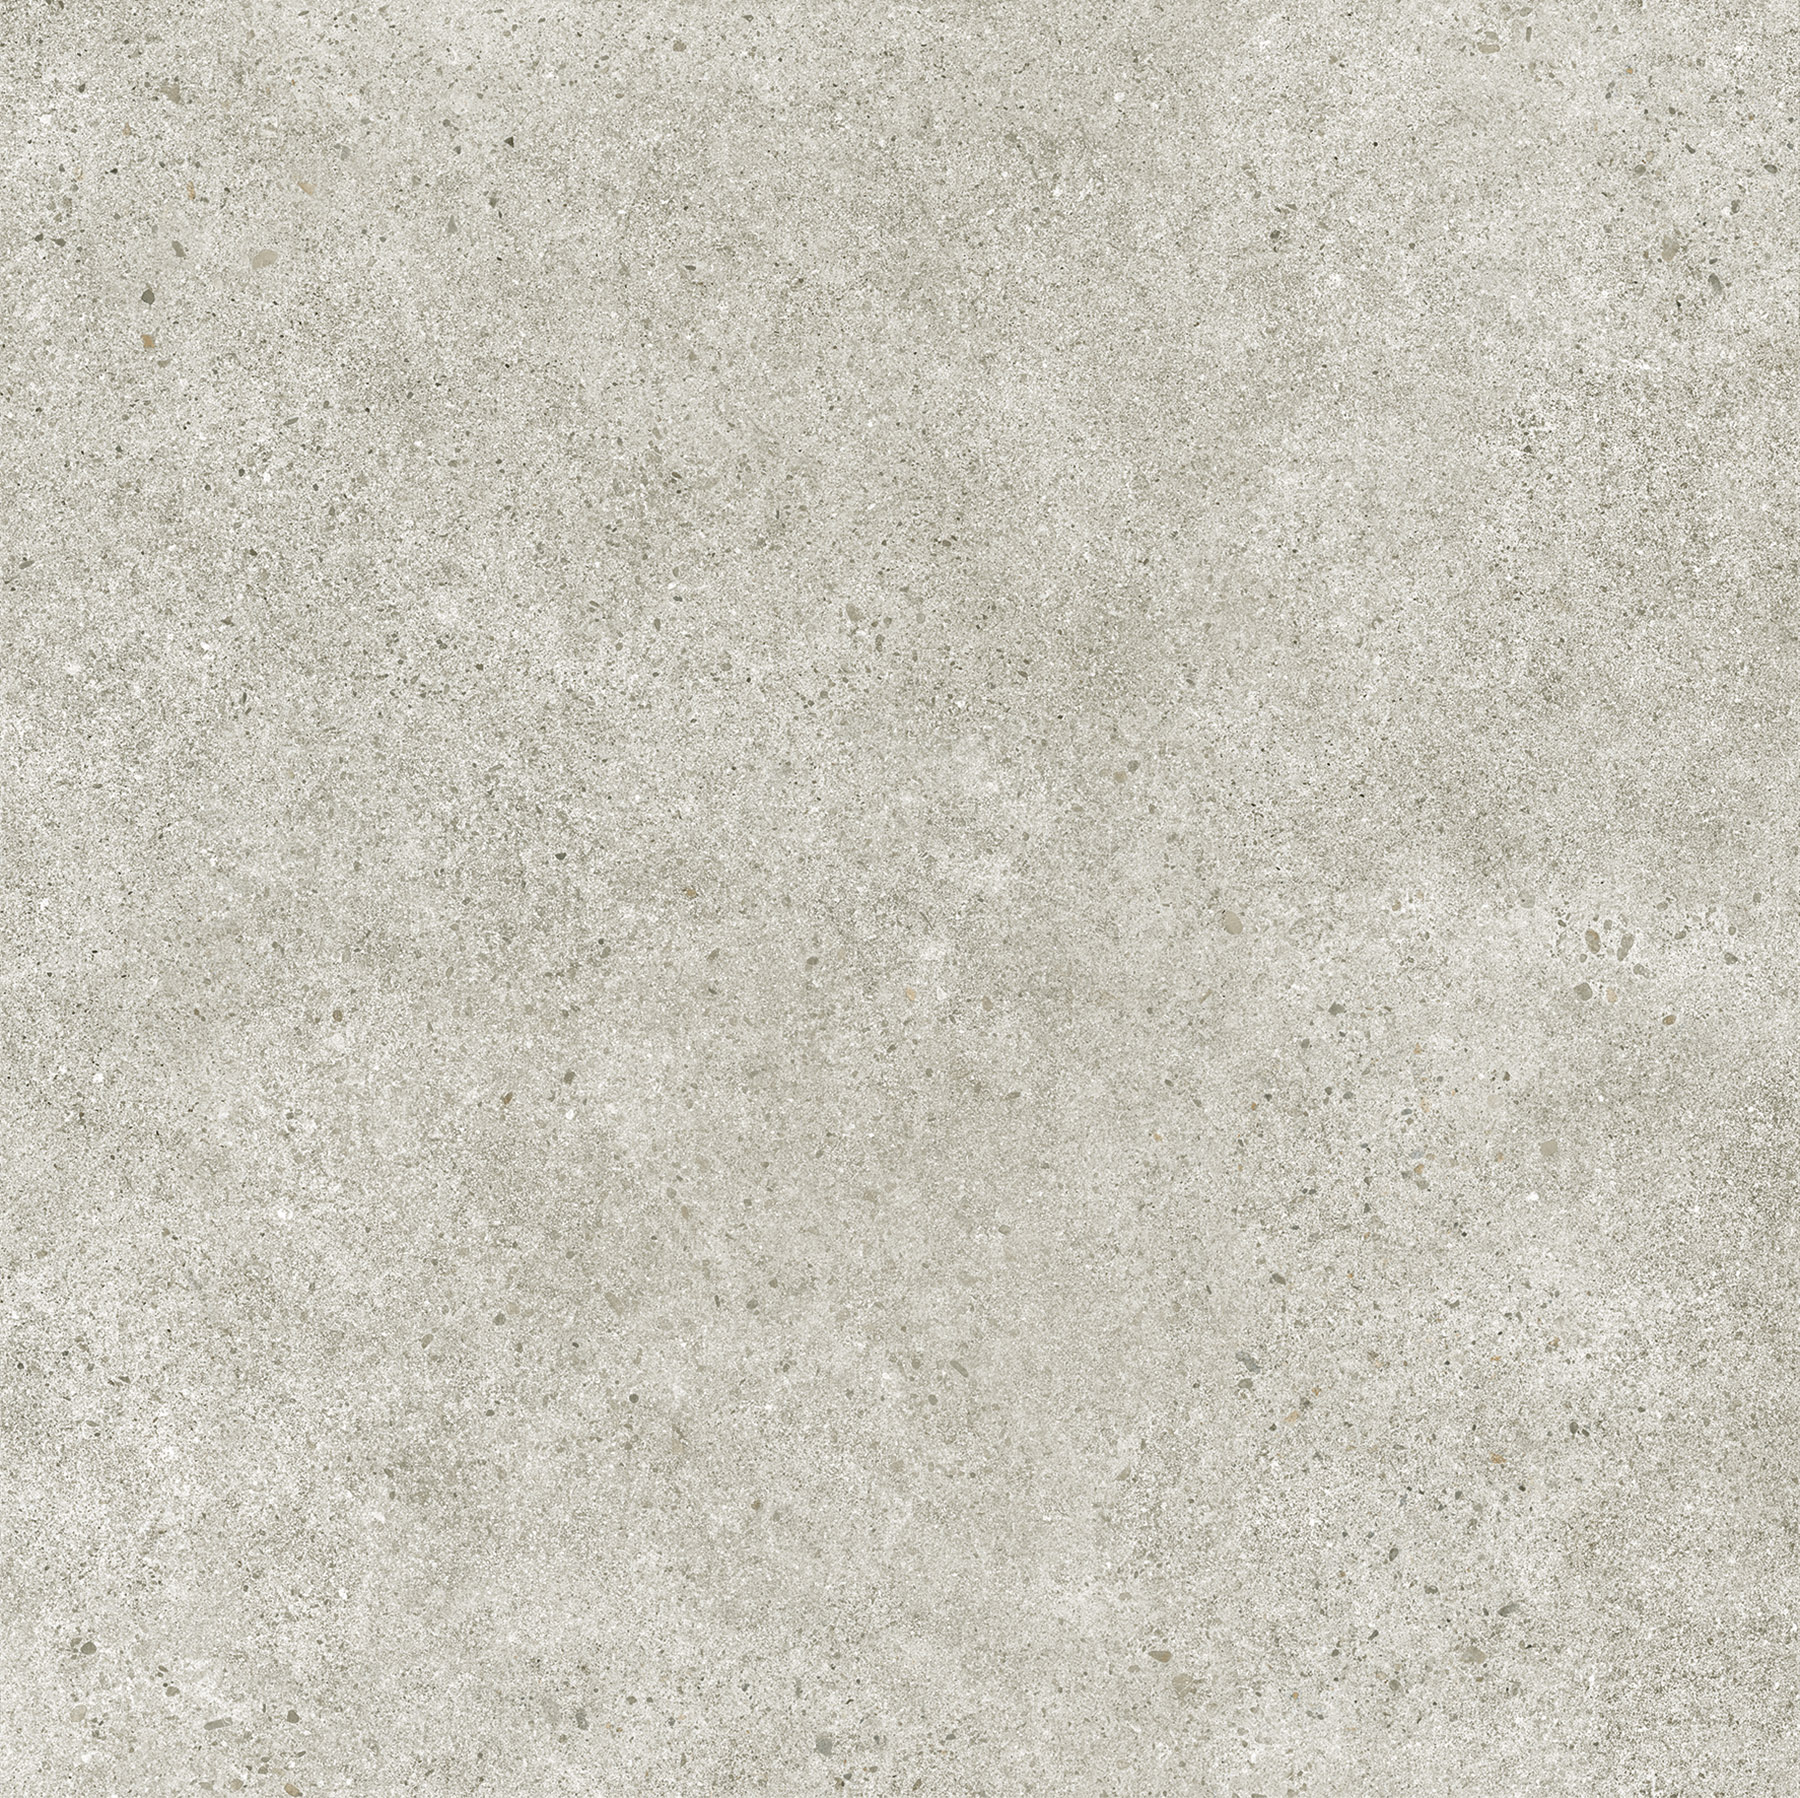 0099640, Deep, Vaaleanharmaa, lattia,pakkasenkesto,liukastumisenesto,uimahalli